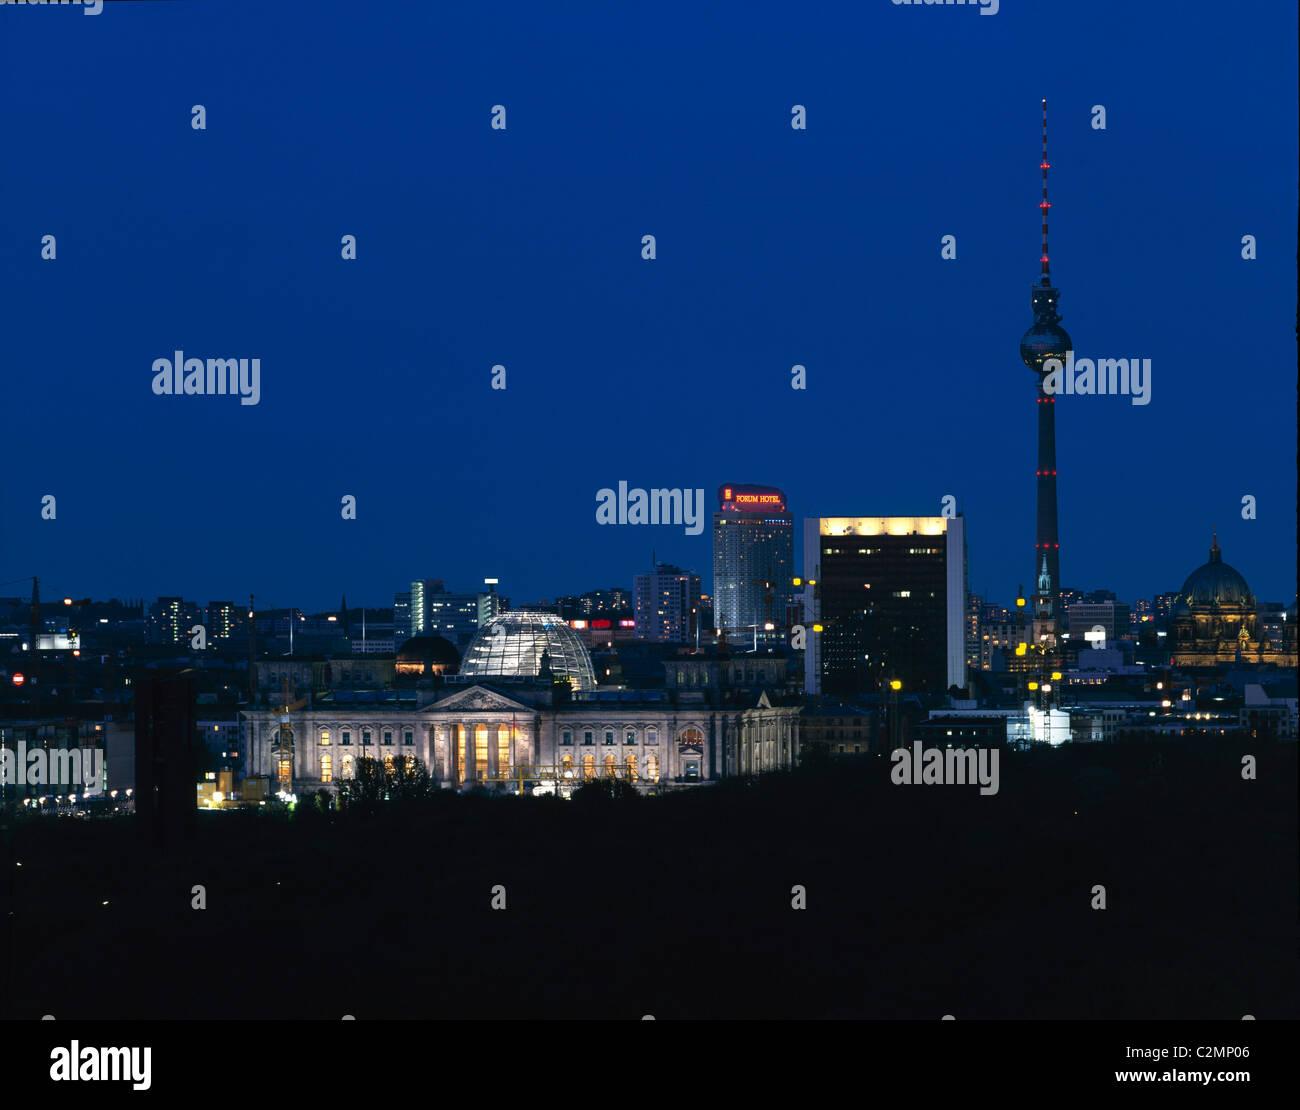 Reichstag, Platz der Republik, Berlin, Germany - Exterior view at night - Stock Image